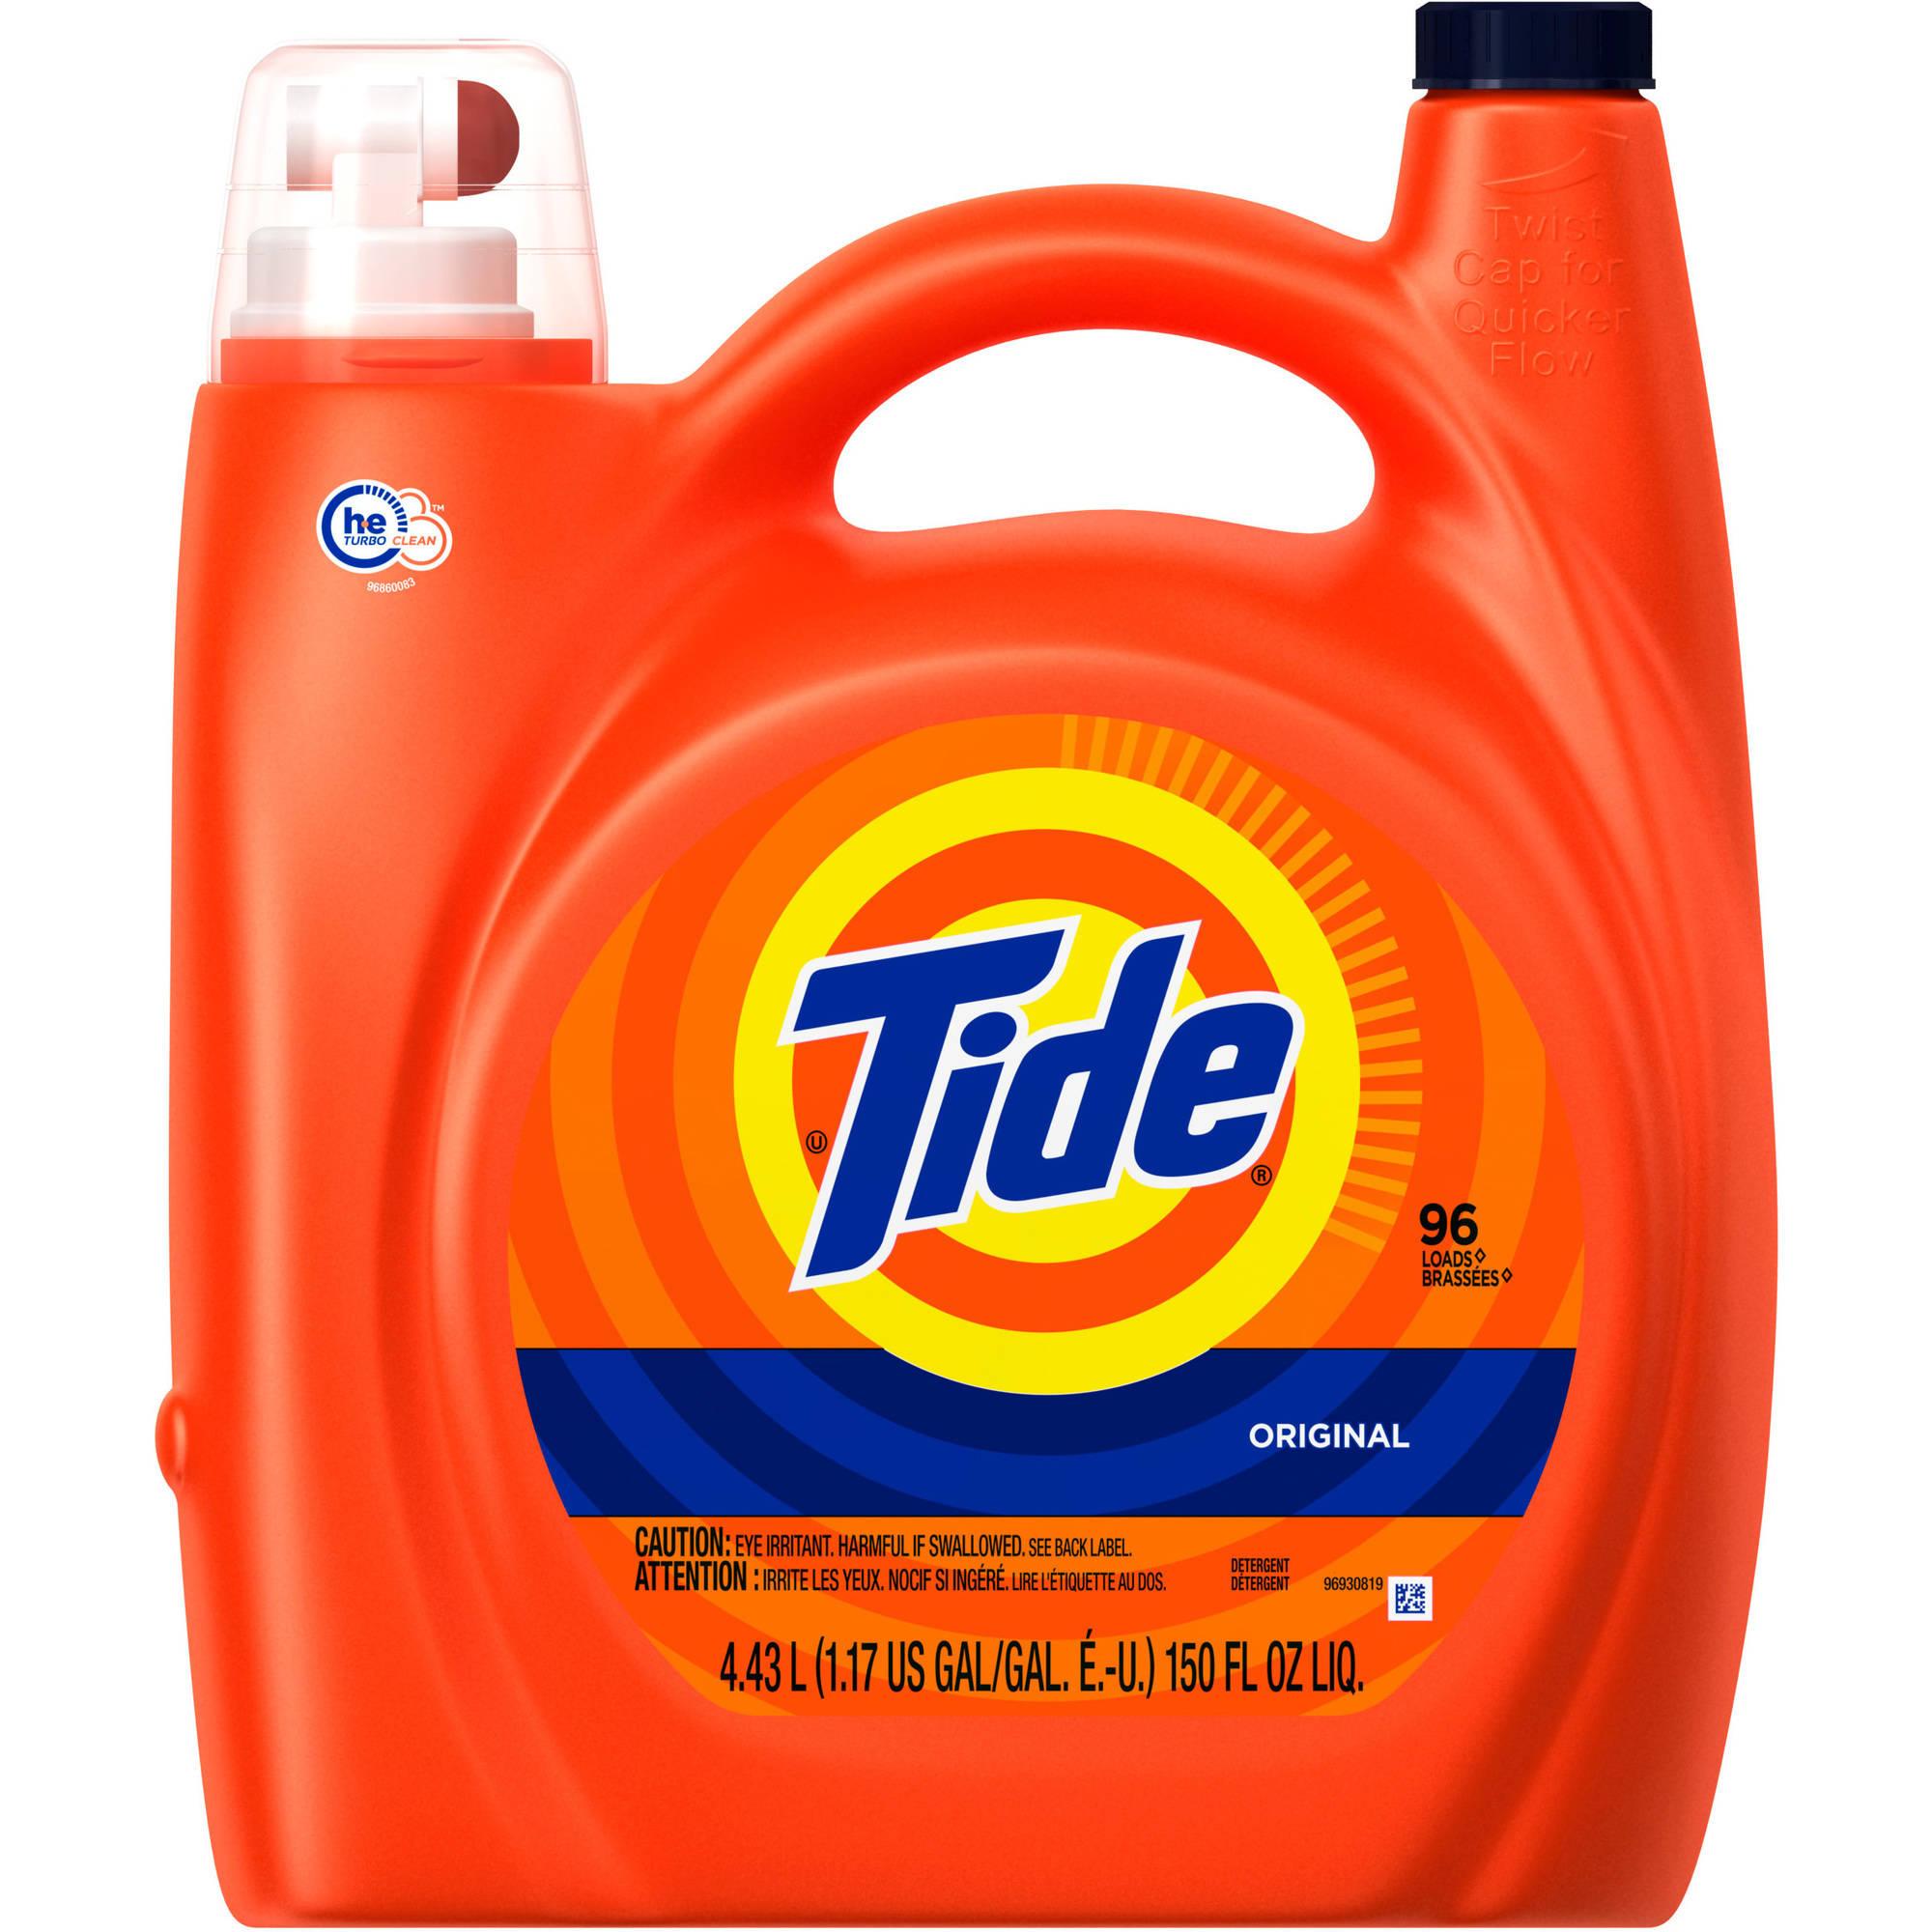 Tide Original Scent HE Turbo Clean Liquid Laundry Detergent, 96 Loads 150 oz